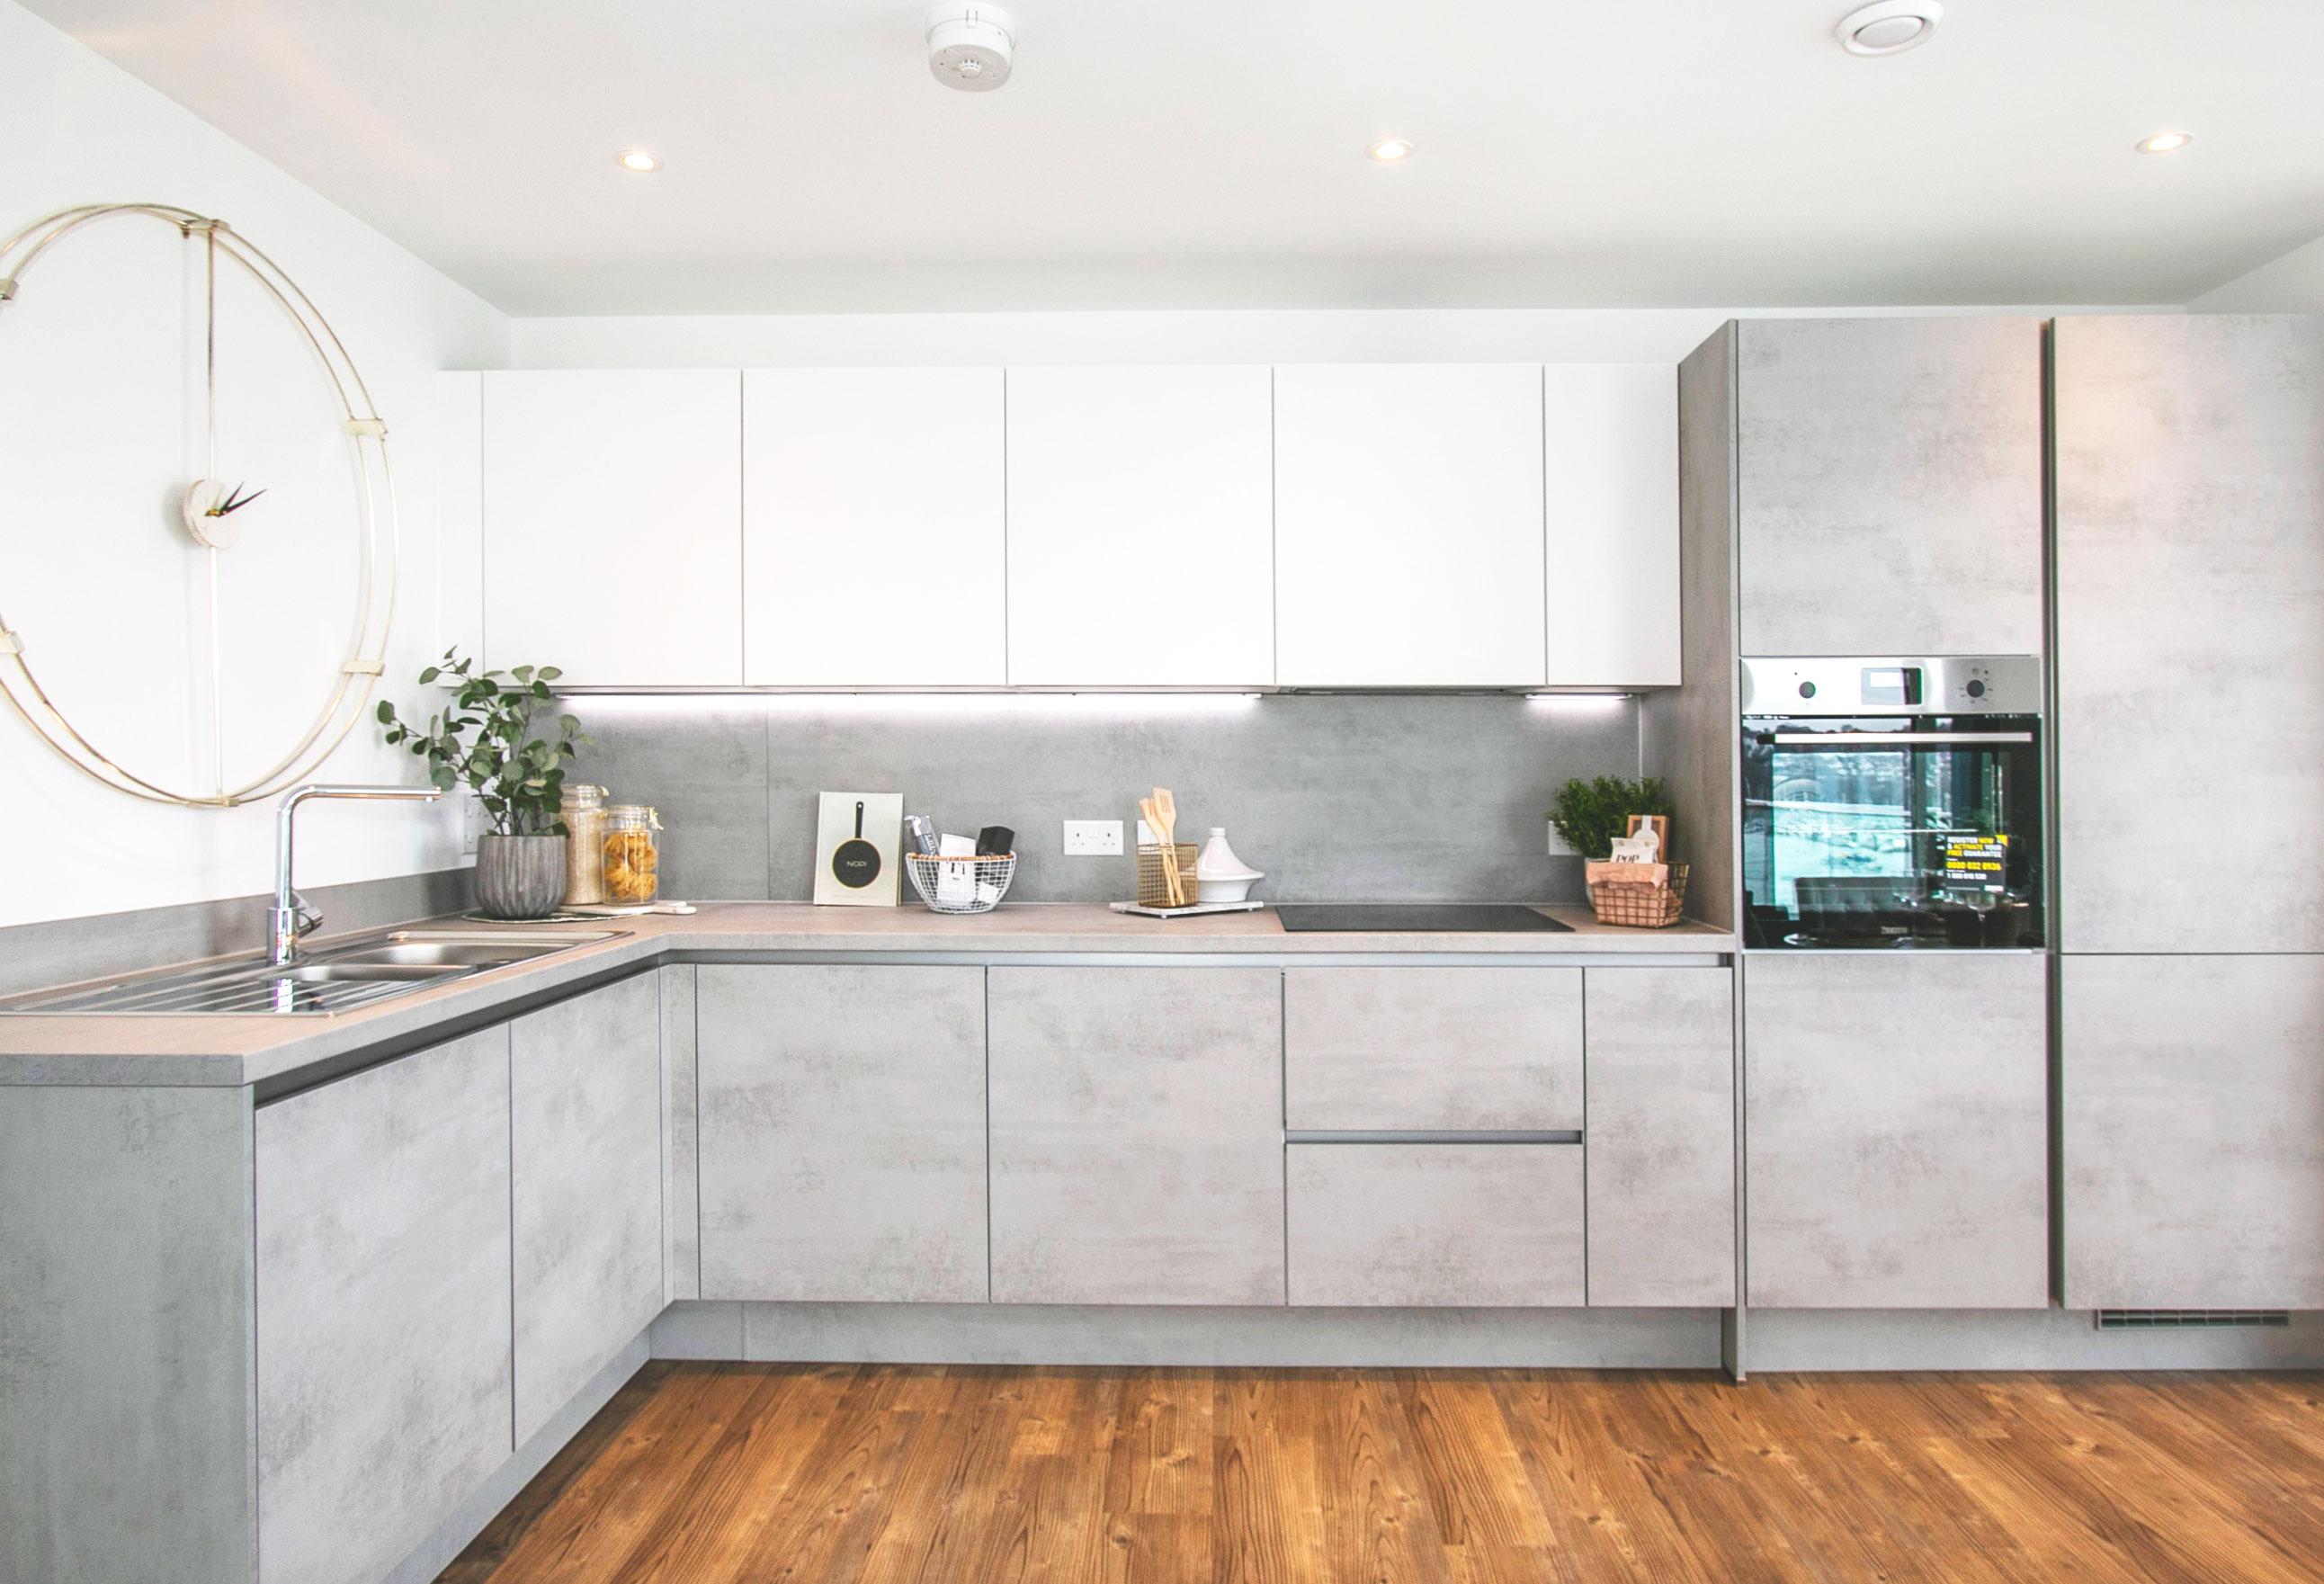 Kitchen, Meridian Waterside, Southampton by Inland Homes.jpg